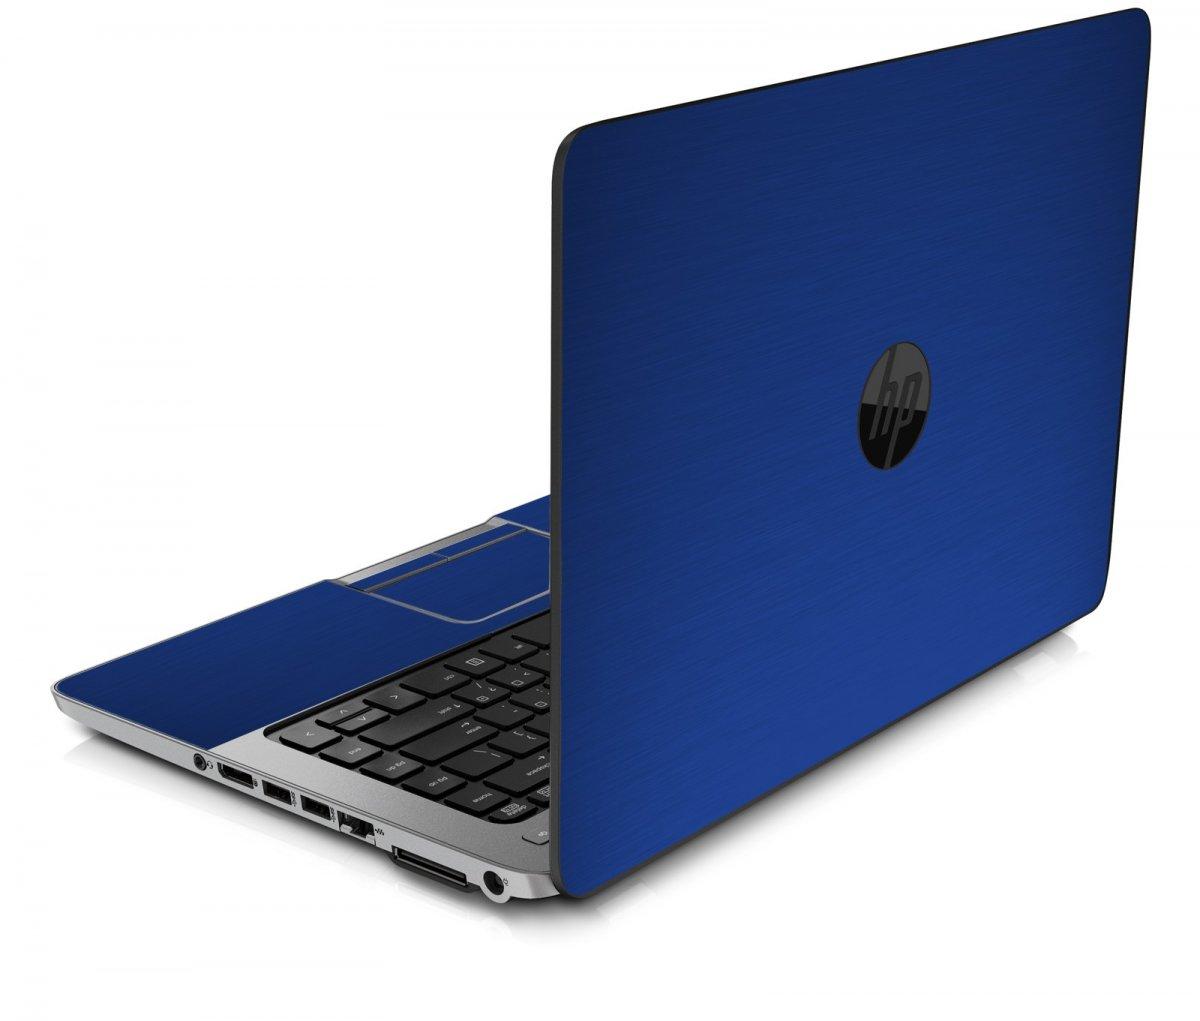 MTSBLUE TEXTURED ALUMINUM HP ProBook 850 G1 Skin